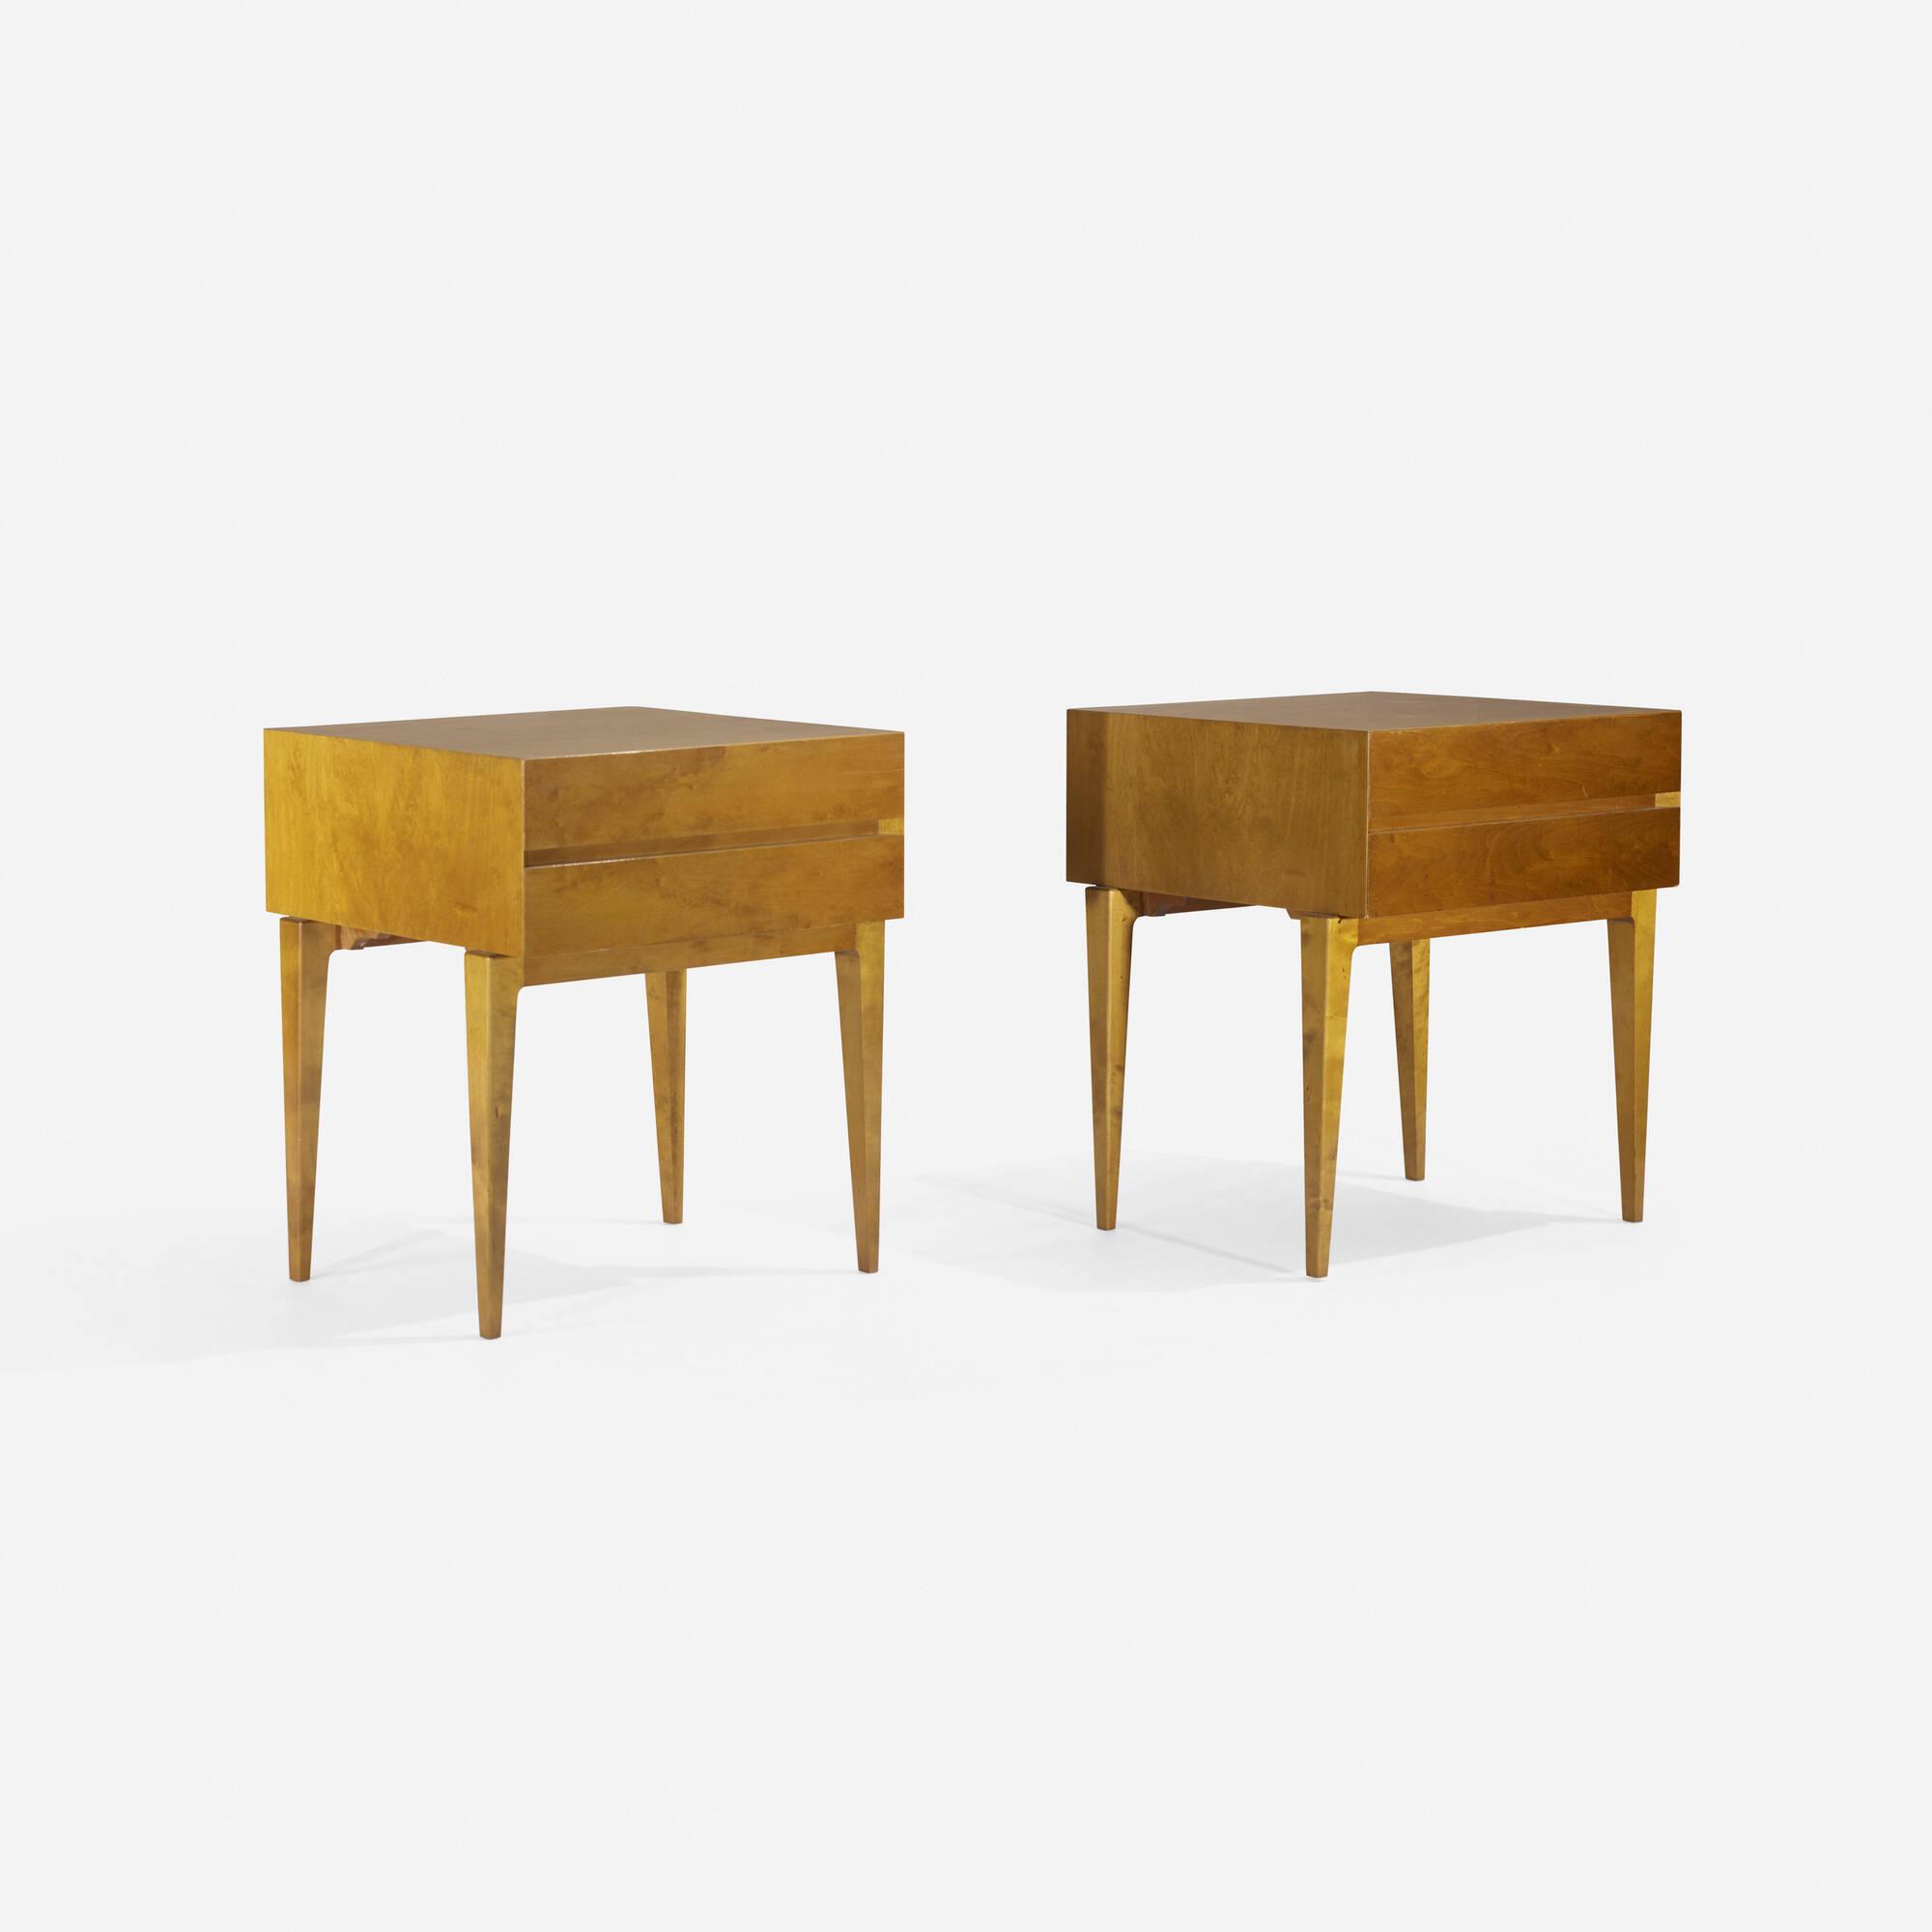 113: Swedish / nightstands, pair (2 of 3)